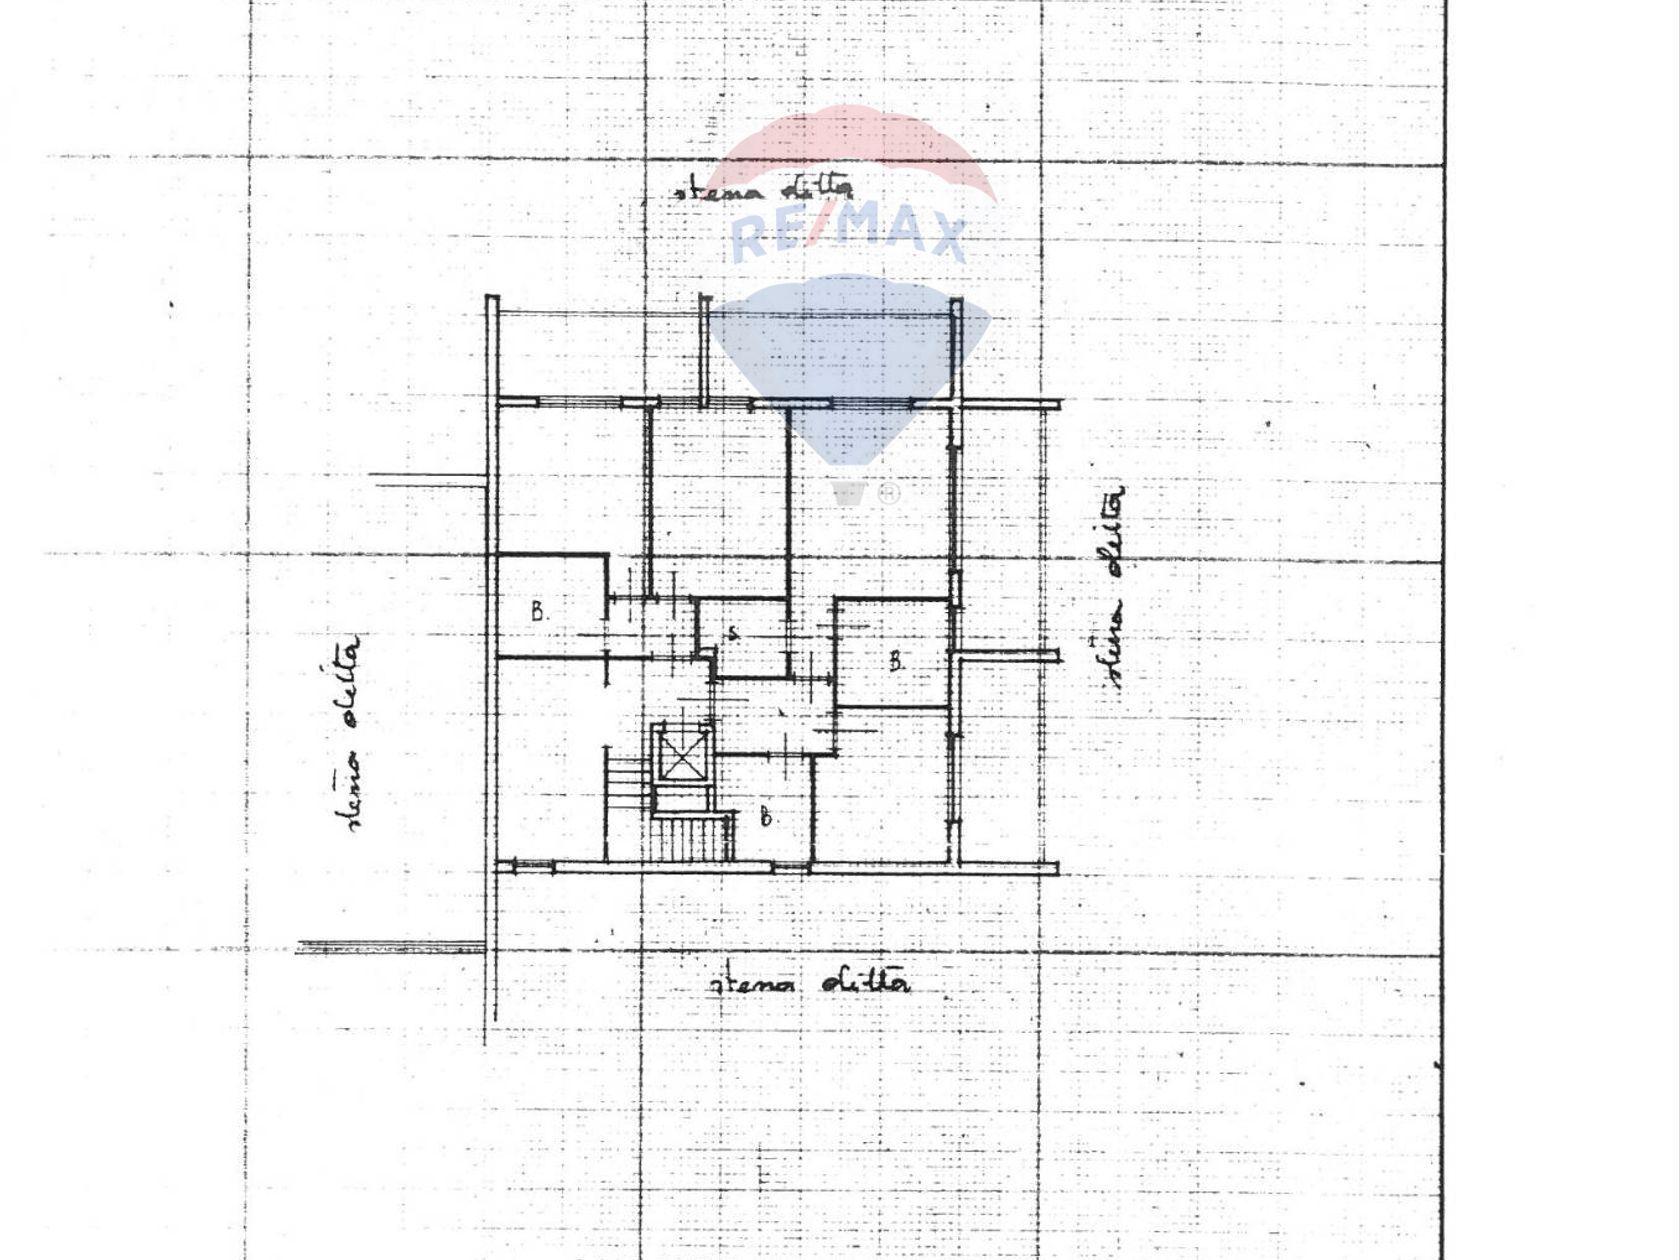 Villa a schiera S. Spirito, Bari, BA Vendita - Planimetria 1